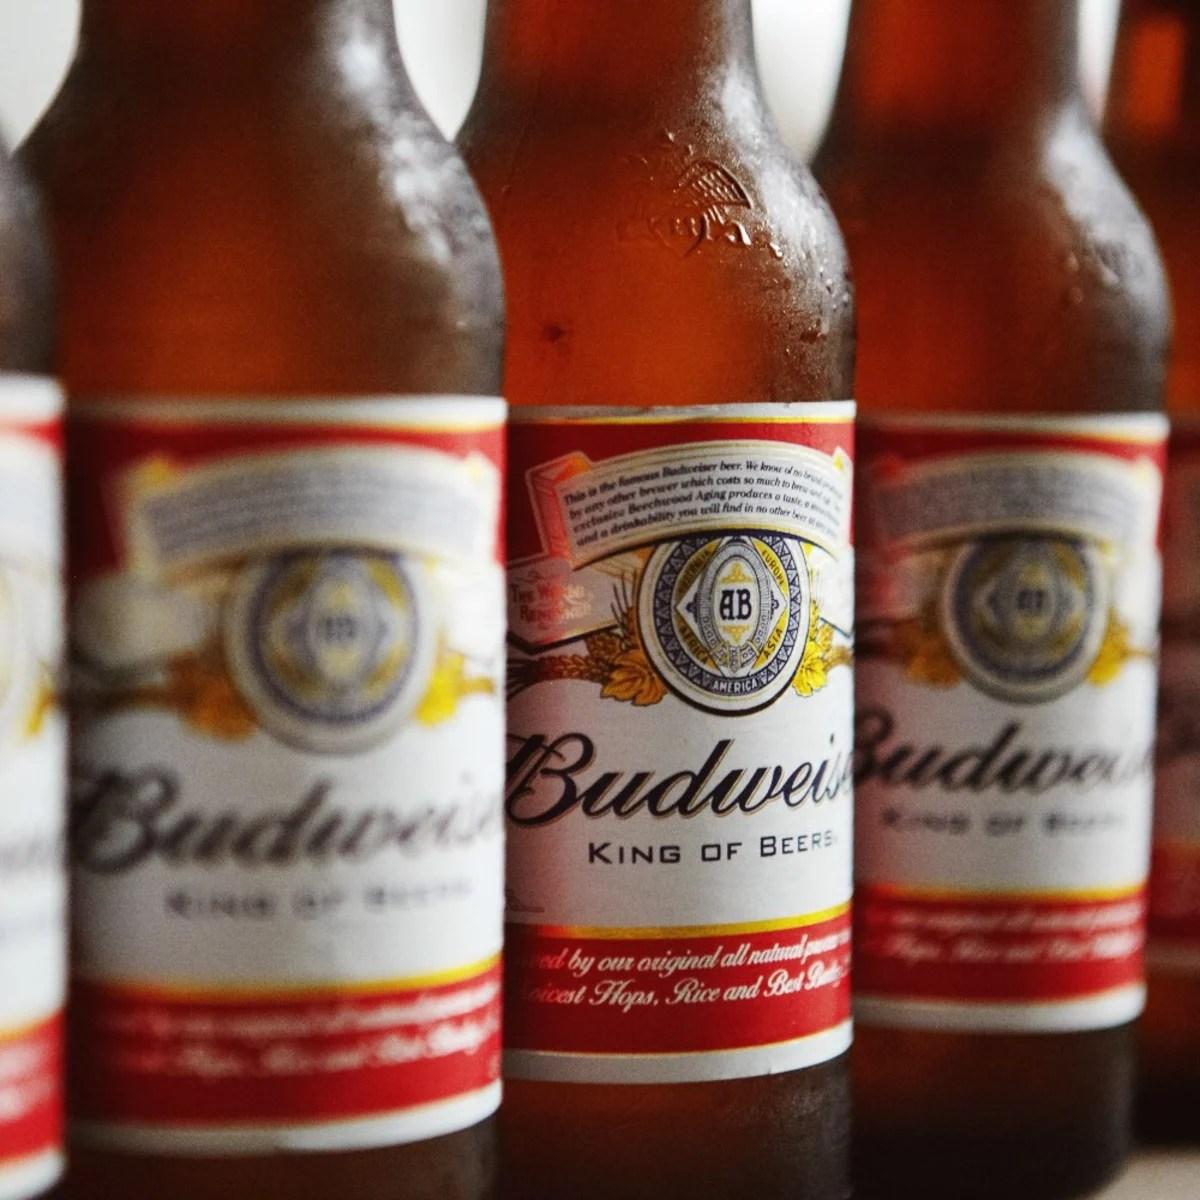 budweiser beer calories - HD1200×1200